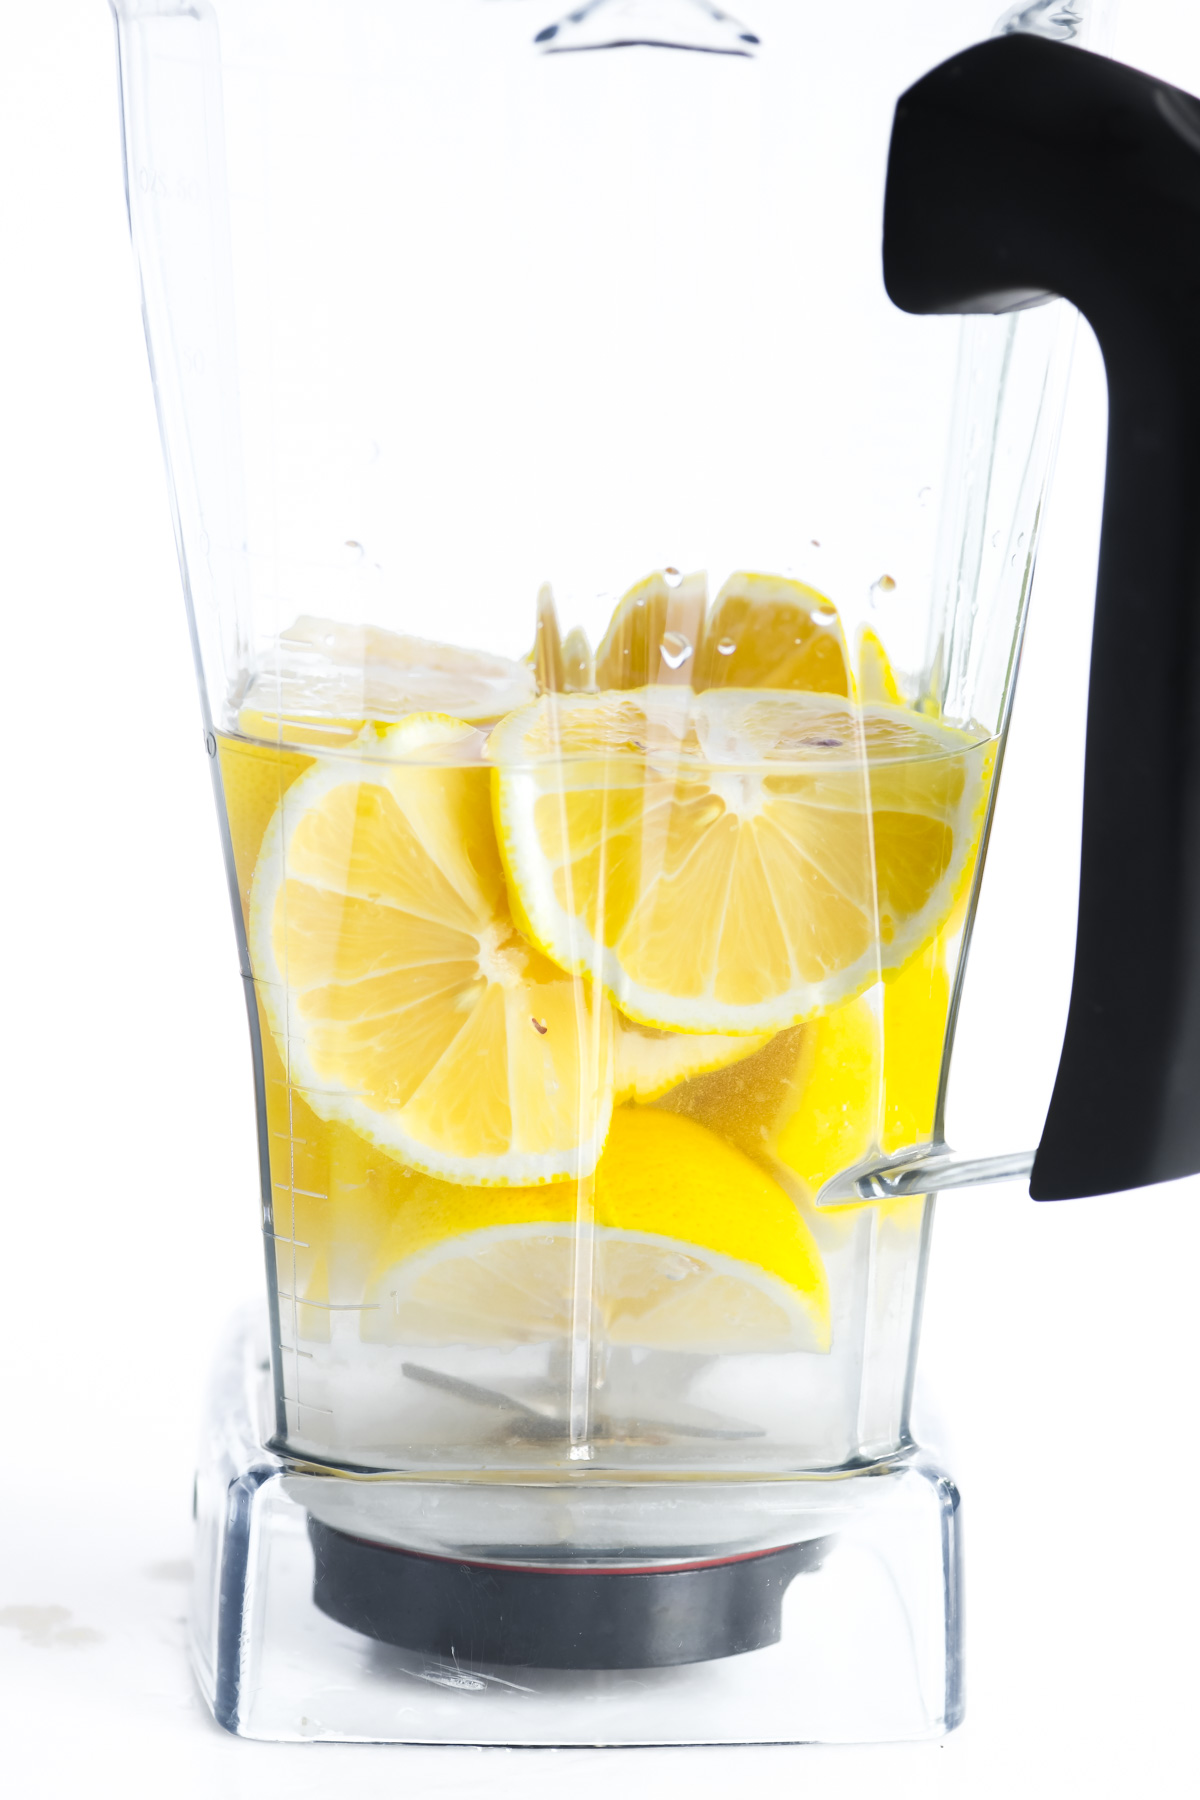 making creamy lemonade in a blender with whole lemons